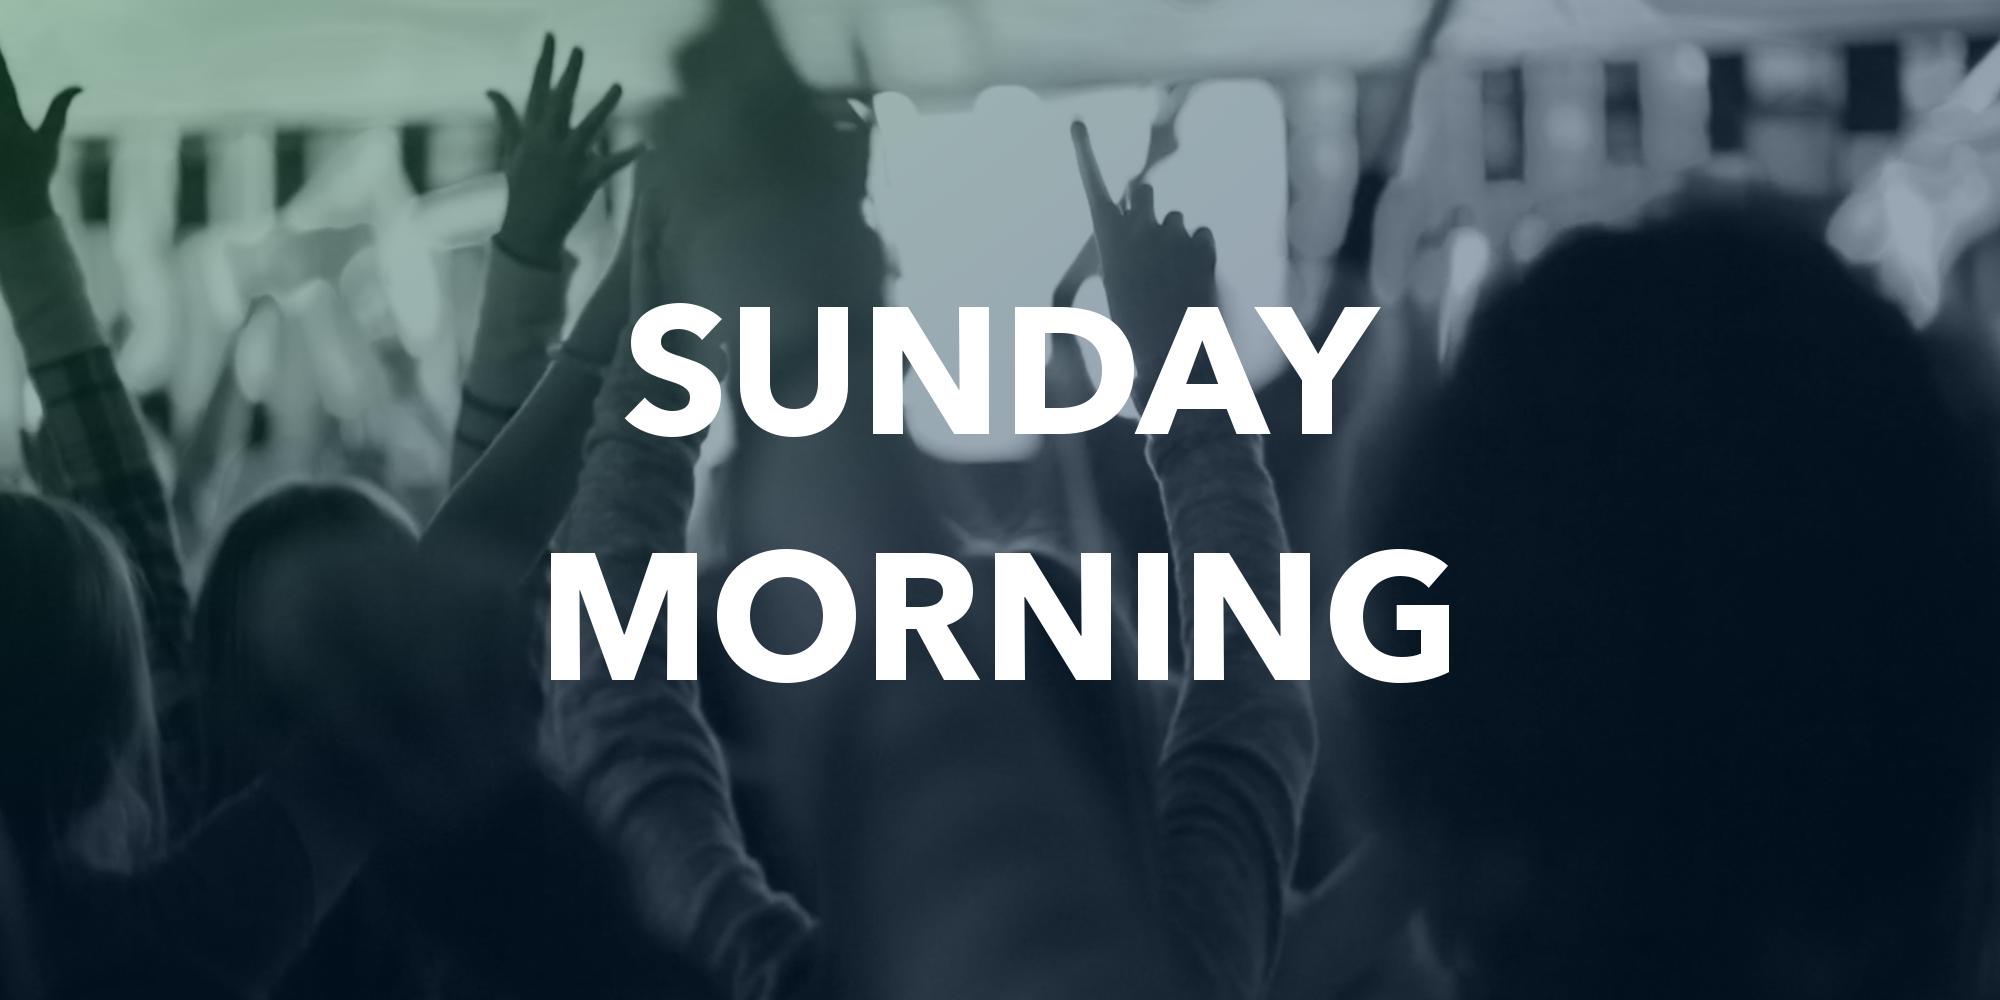 ZKids Sunday Morning..